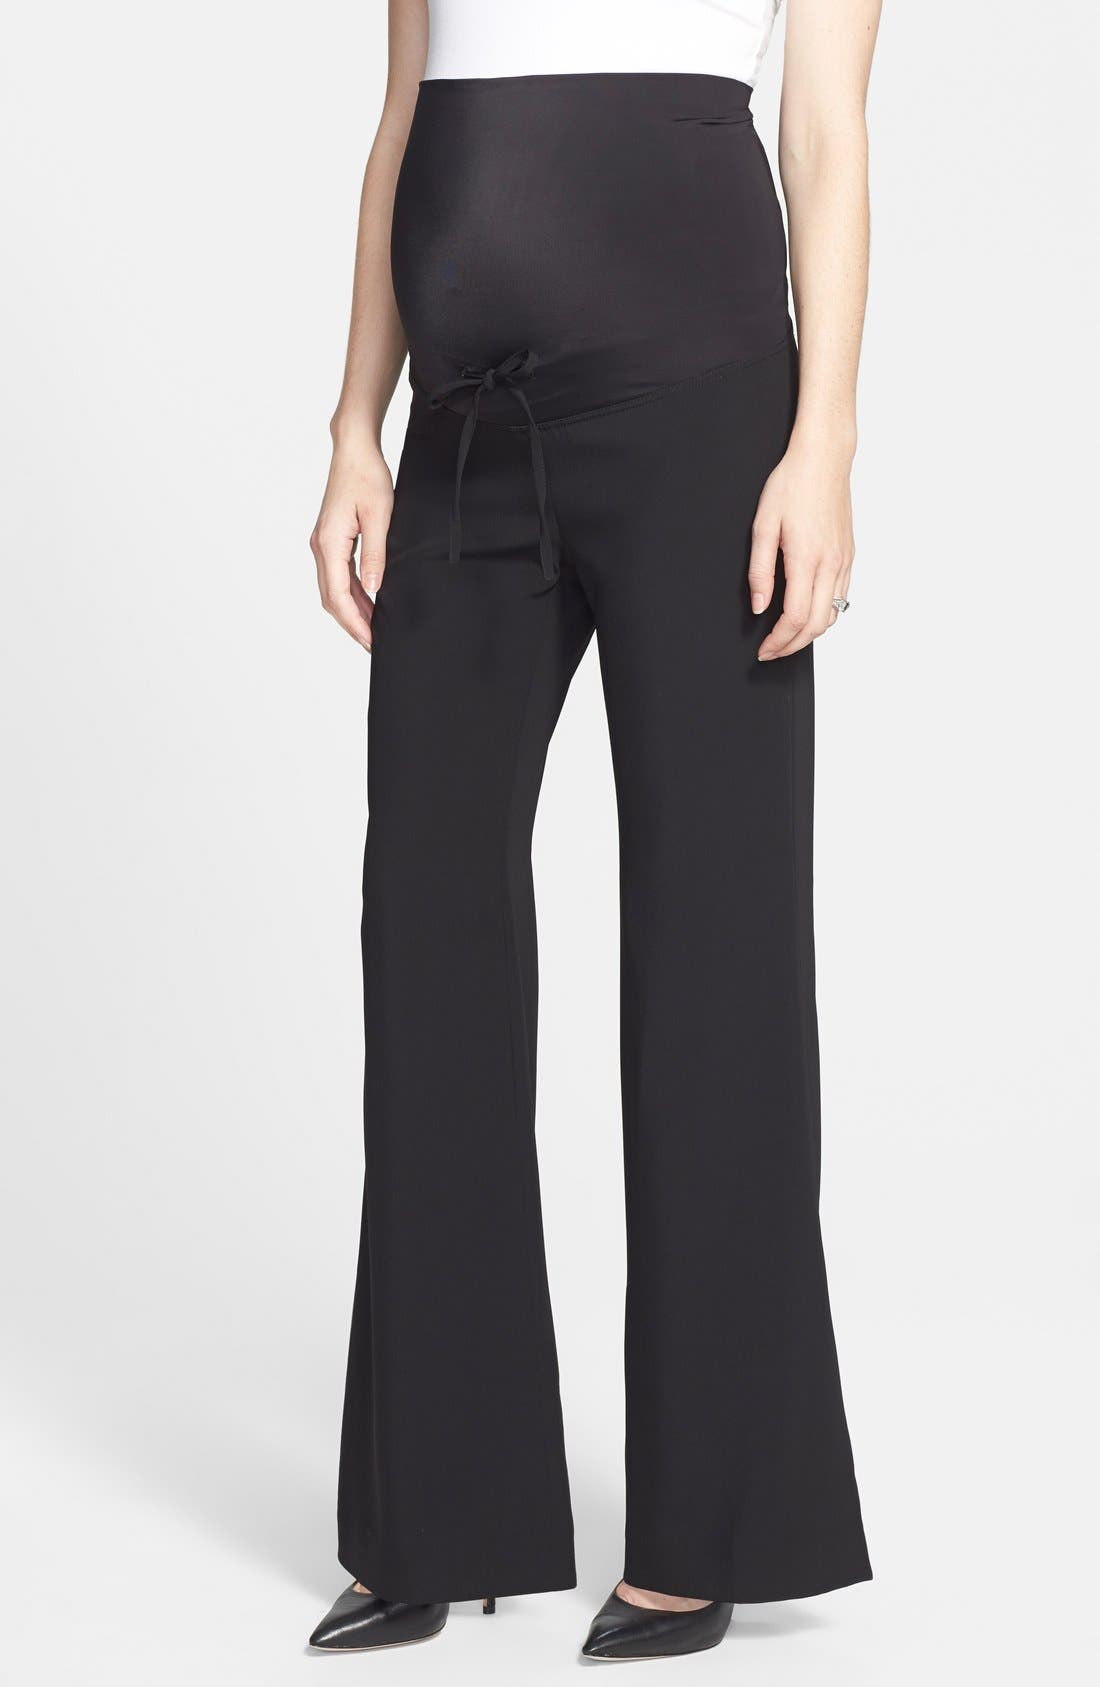 Eva Alexander London 'Lauren' Maternity Pants